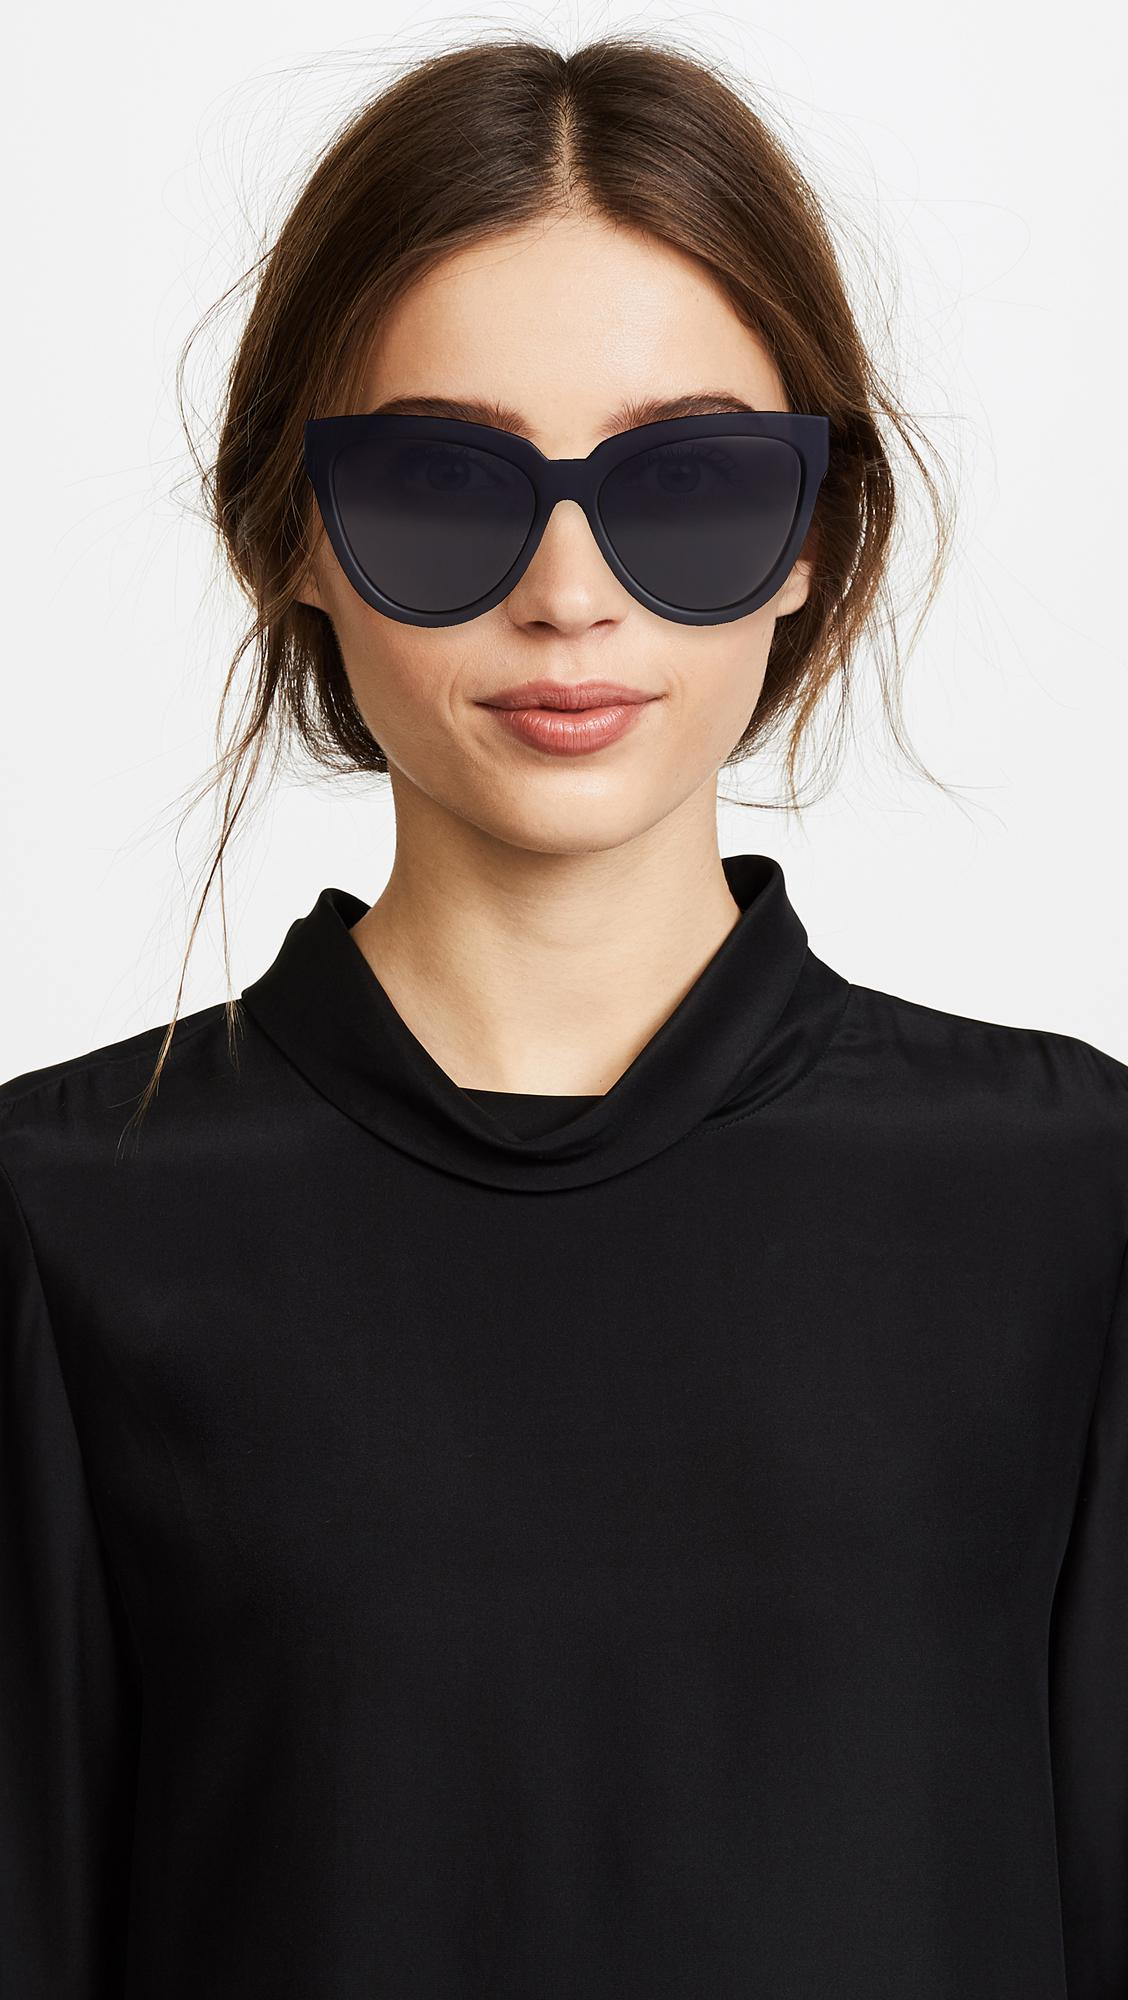 dfe48b8710 Le Specs - Black Liar Liar Sunglasses - Lyst. View fullscreen